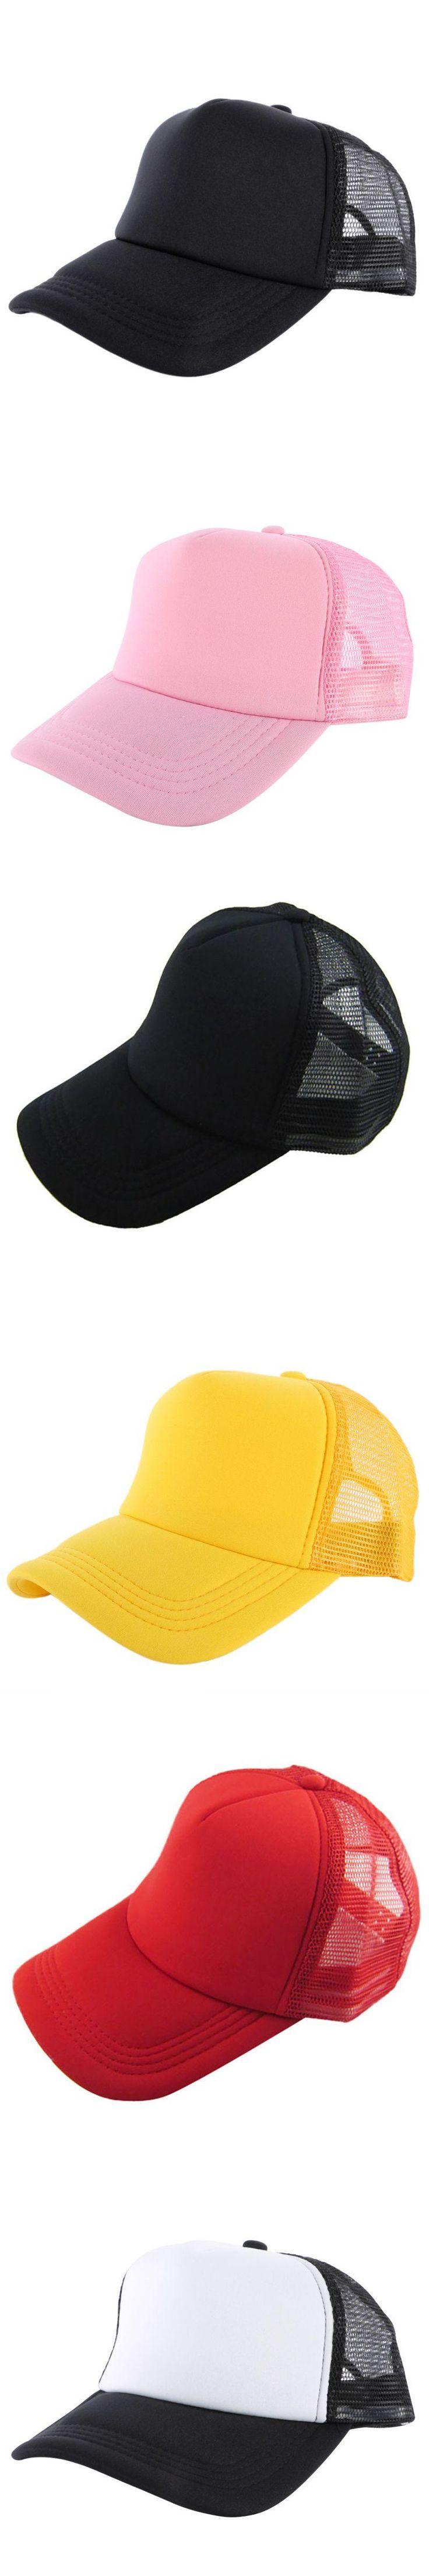 Unisex Attractive Casual Fashion Men Women Summer Hat Solid Baseball Cap Trucker Mesh Blank Visor Hats Adjustable Hot